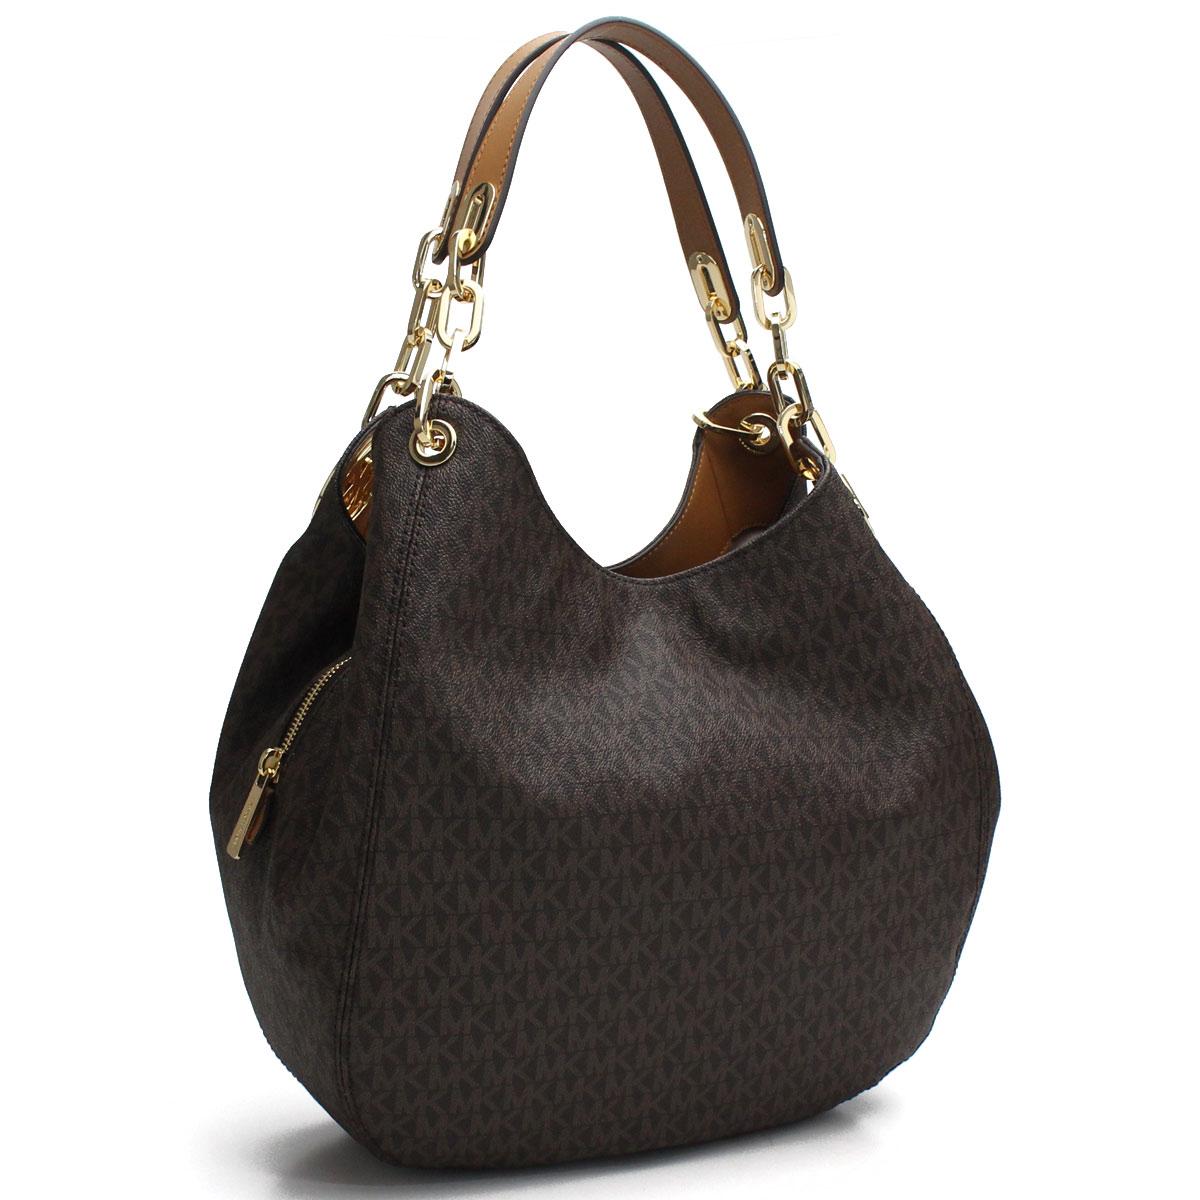 7578f7eb9e7056 Bighit The total brand wholesale: Michael Kors MICHAEL KORS FULTON Fulton  tote bag 30S7GFTL3B BROWN brown system | Rakuten Global Market